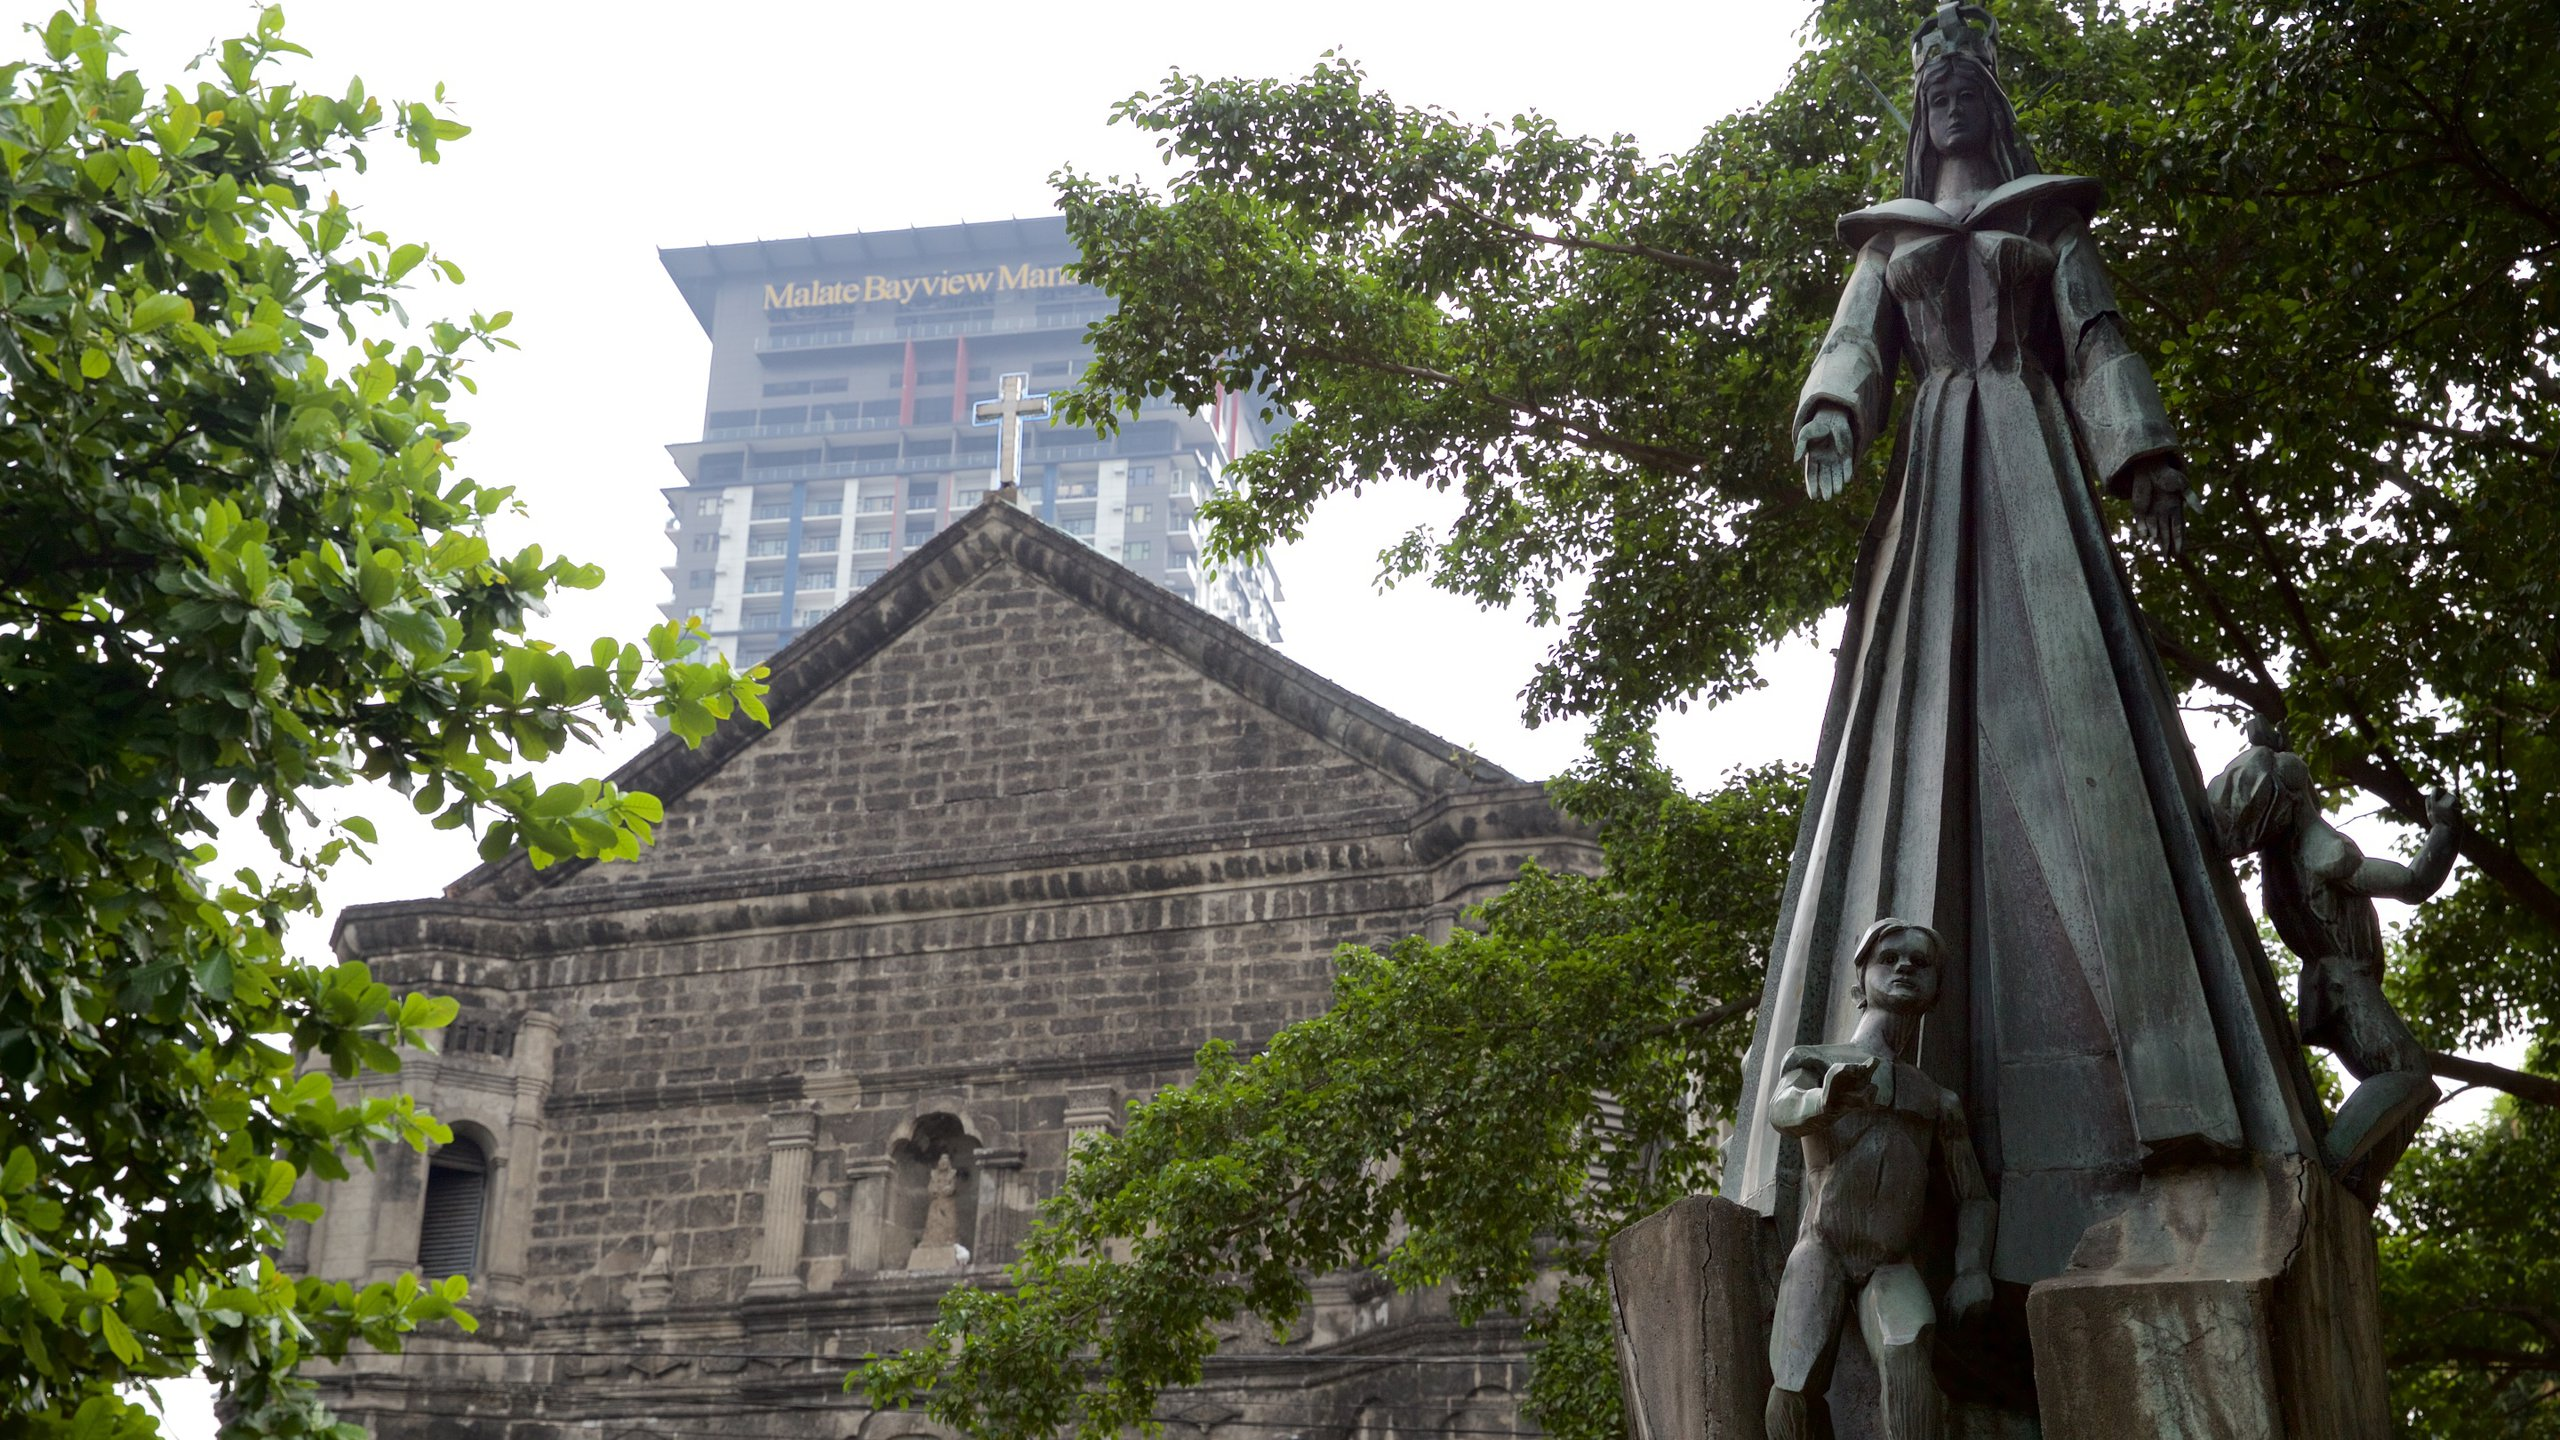 Malate, Manila, National Capital Region, Philippines